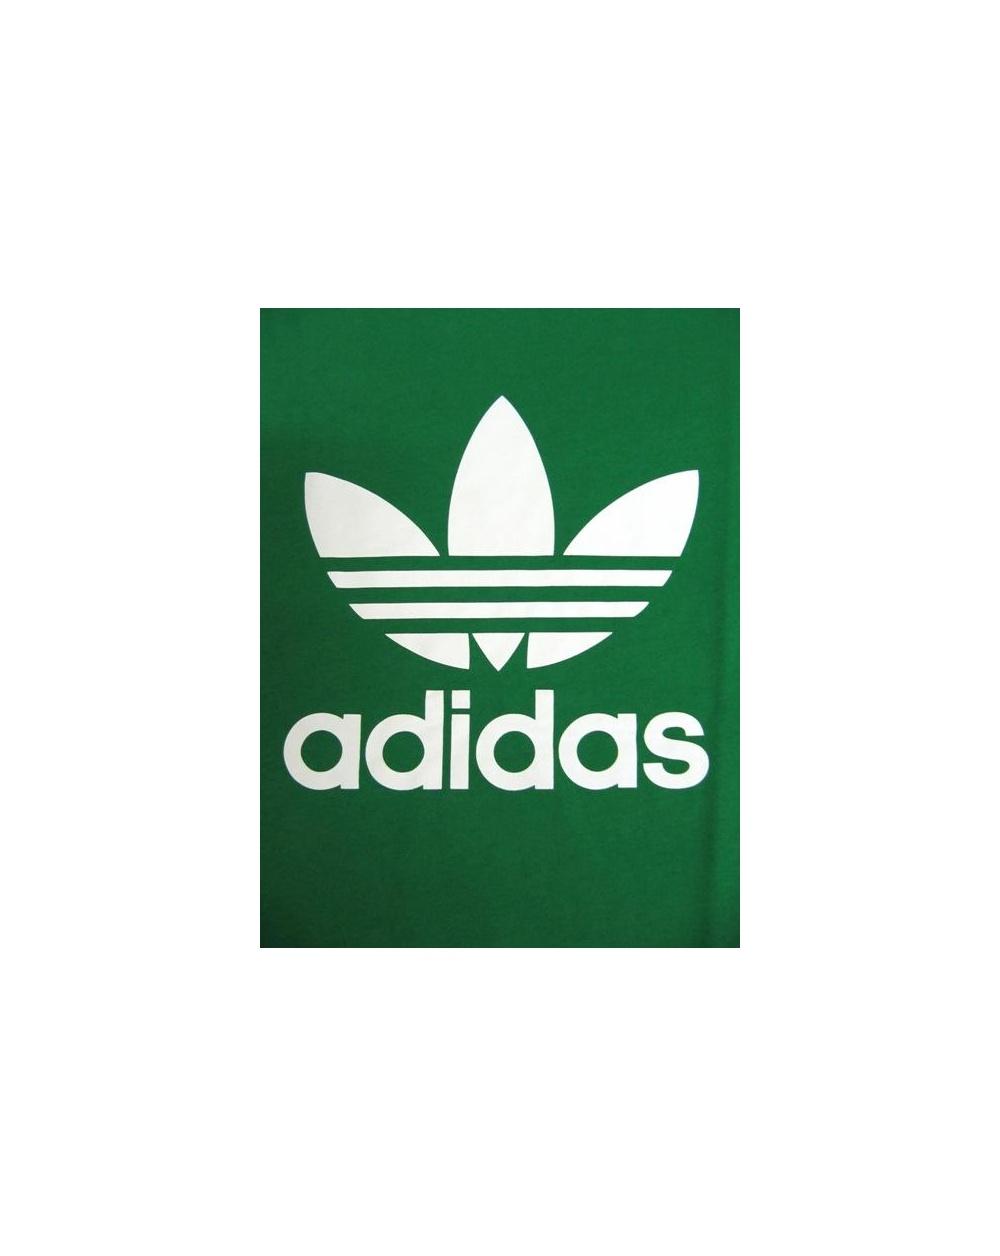 Adidas Originals Trefoil T-shirt With Large Logo Green